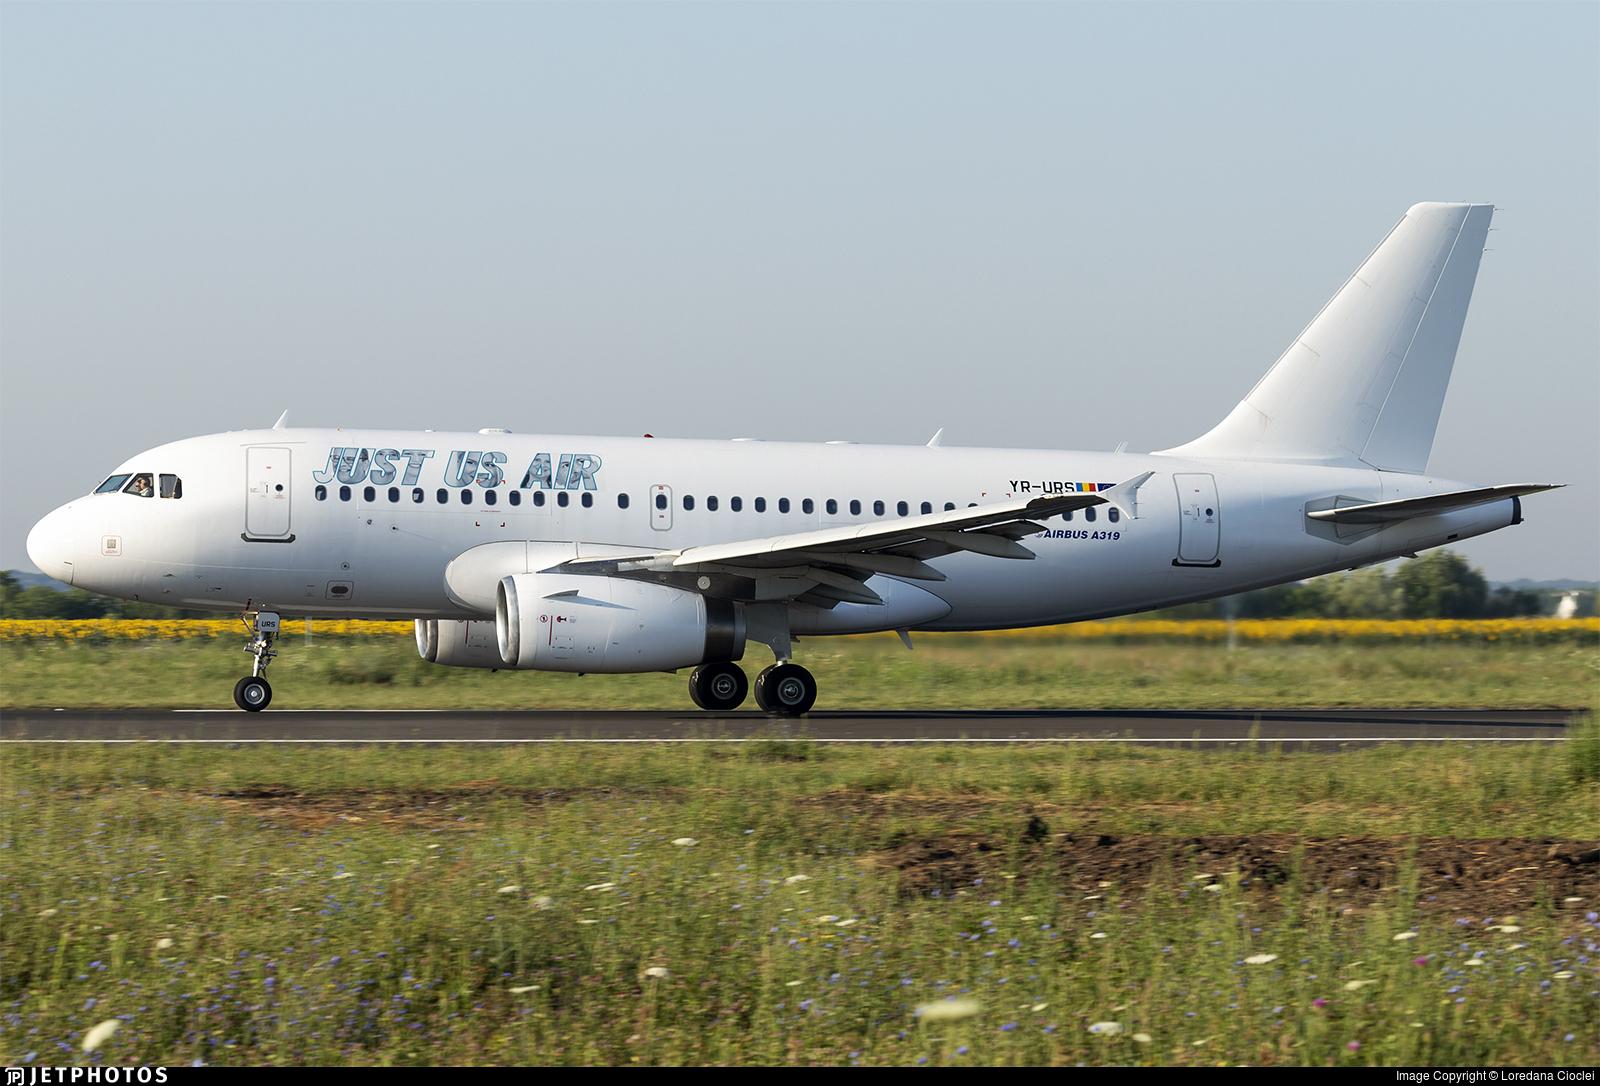 YR-URS - Airbus A319-132 - Just Us Air